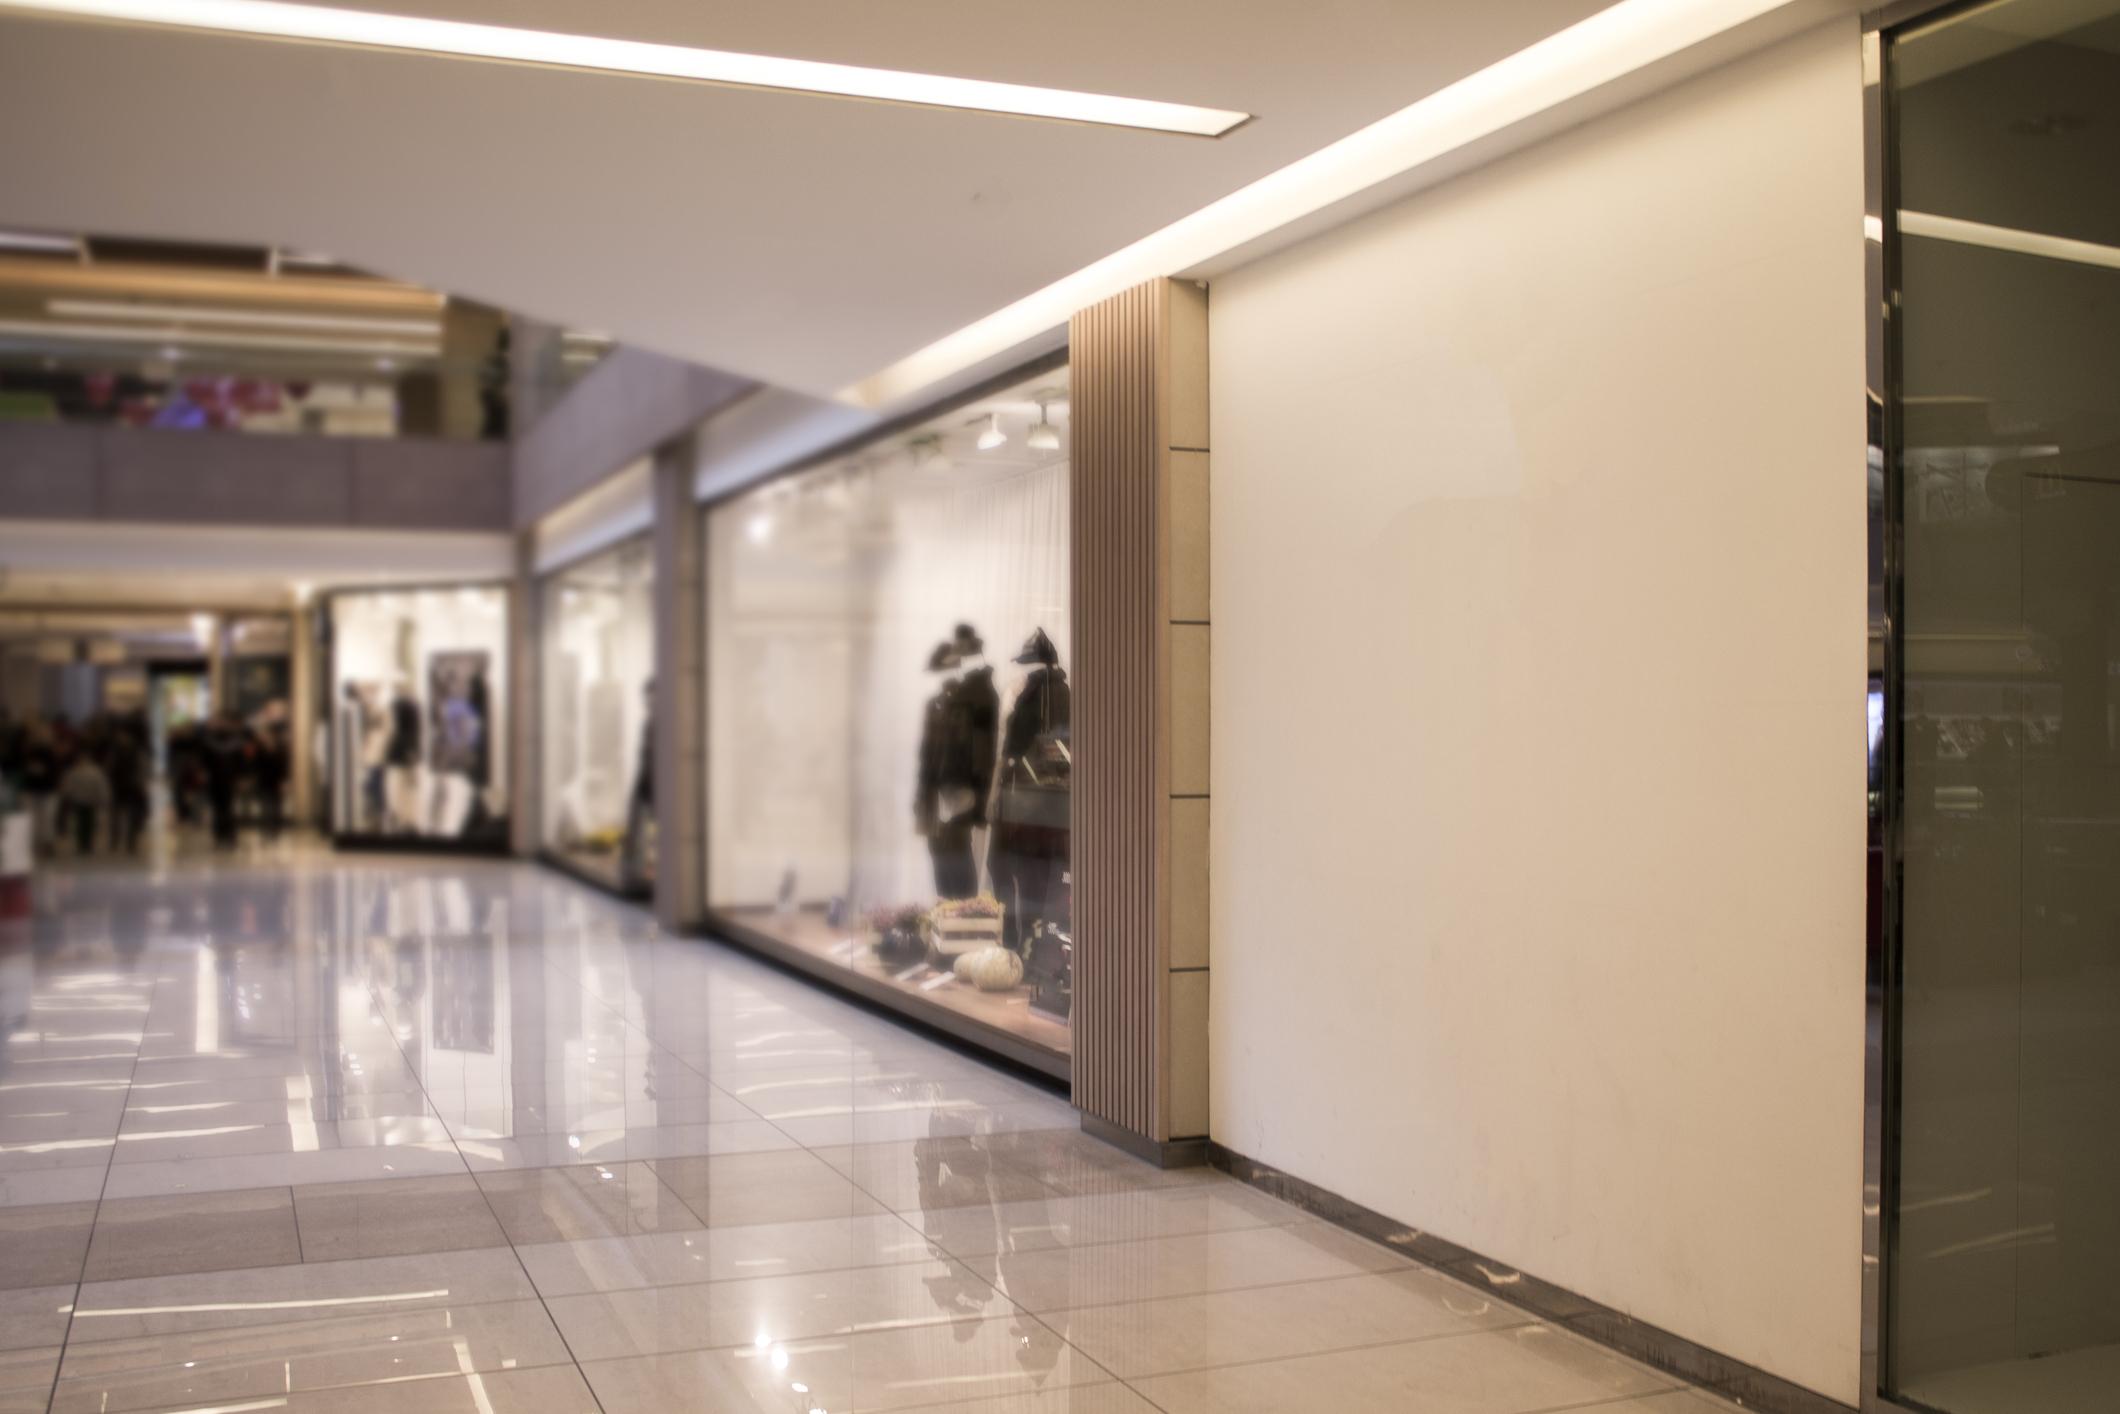 A corridor in a mall.